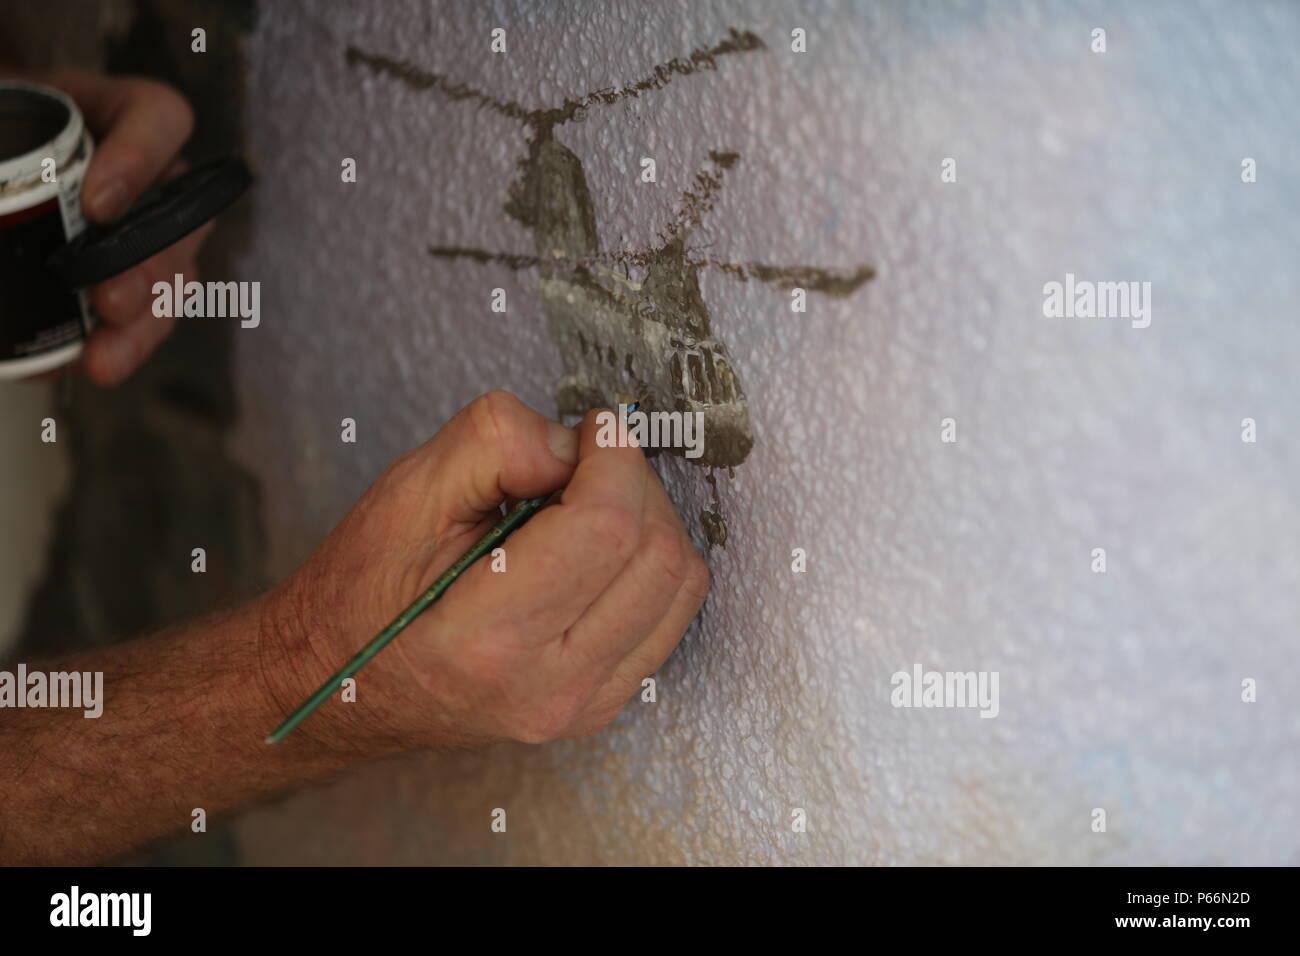 10 46 Stockfotos & 10 46 Bilder - Seite 6 - Alamy